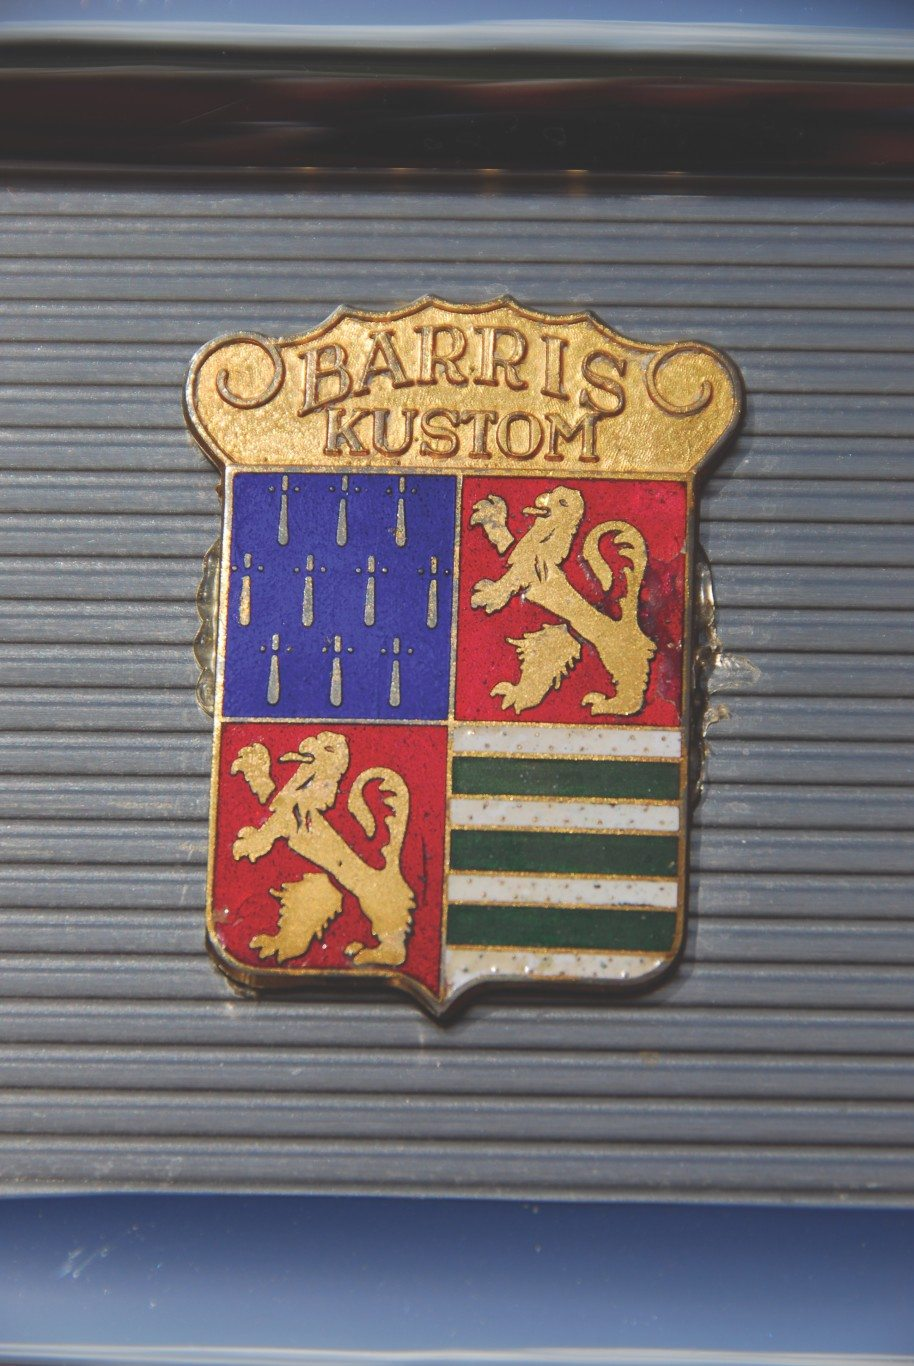 1955 Chevy Aztec Custom Barris Kustom Badge